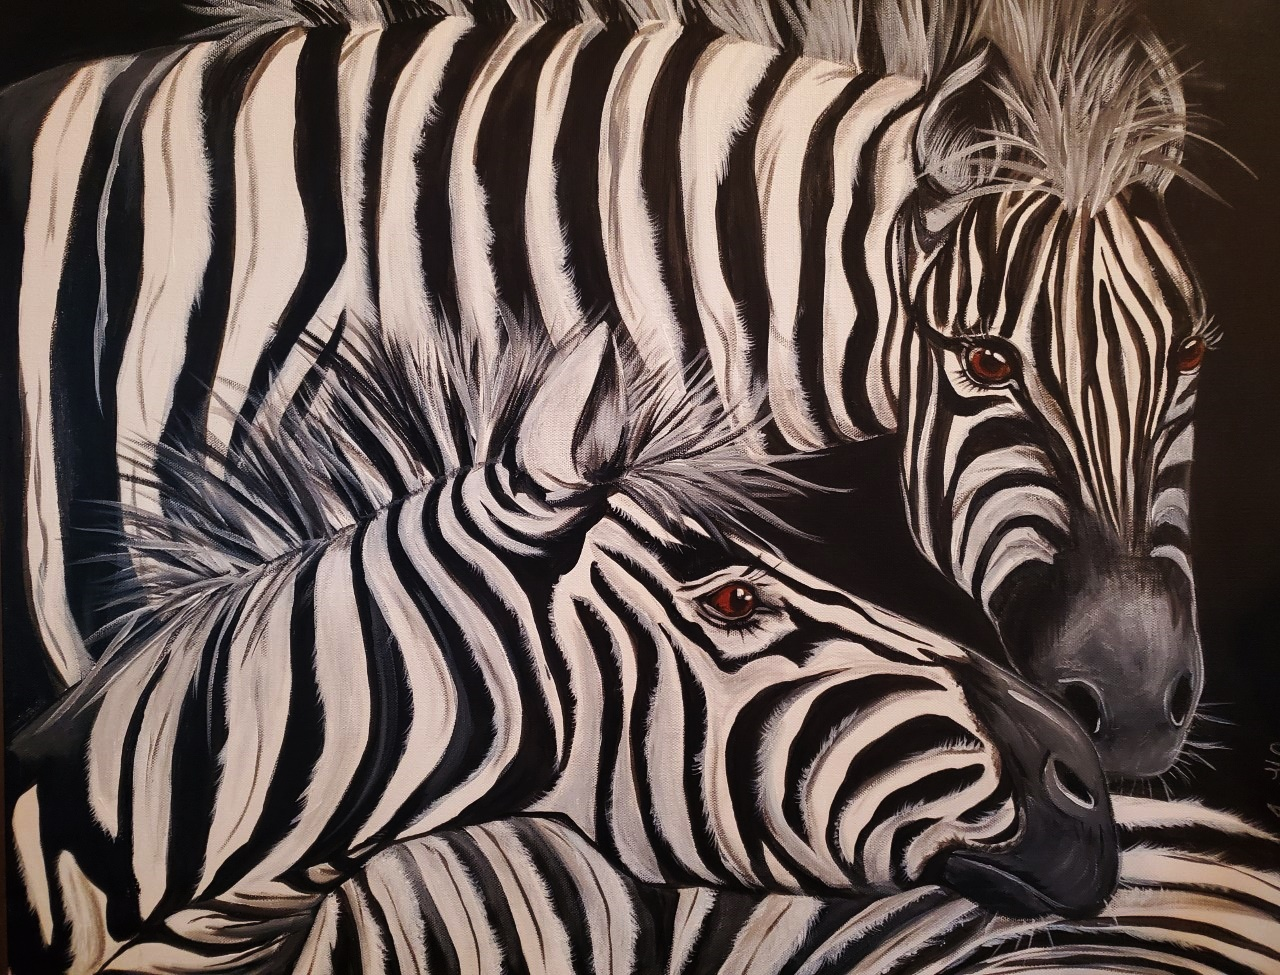 The Individuality spirit of the Zebra